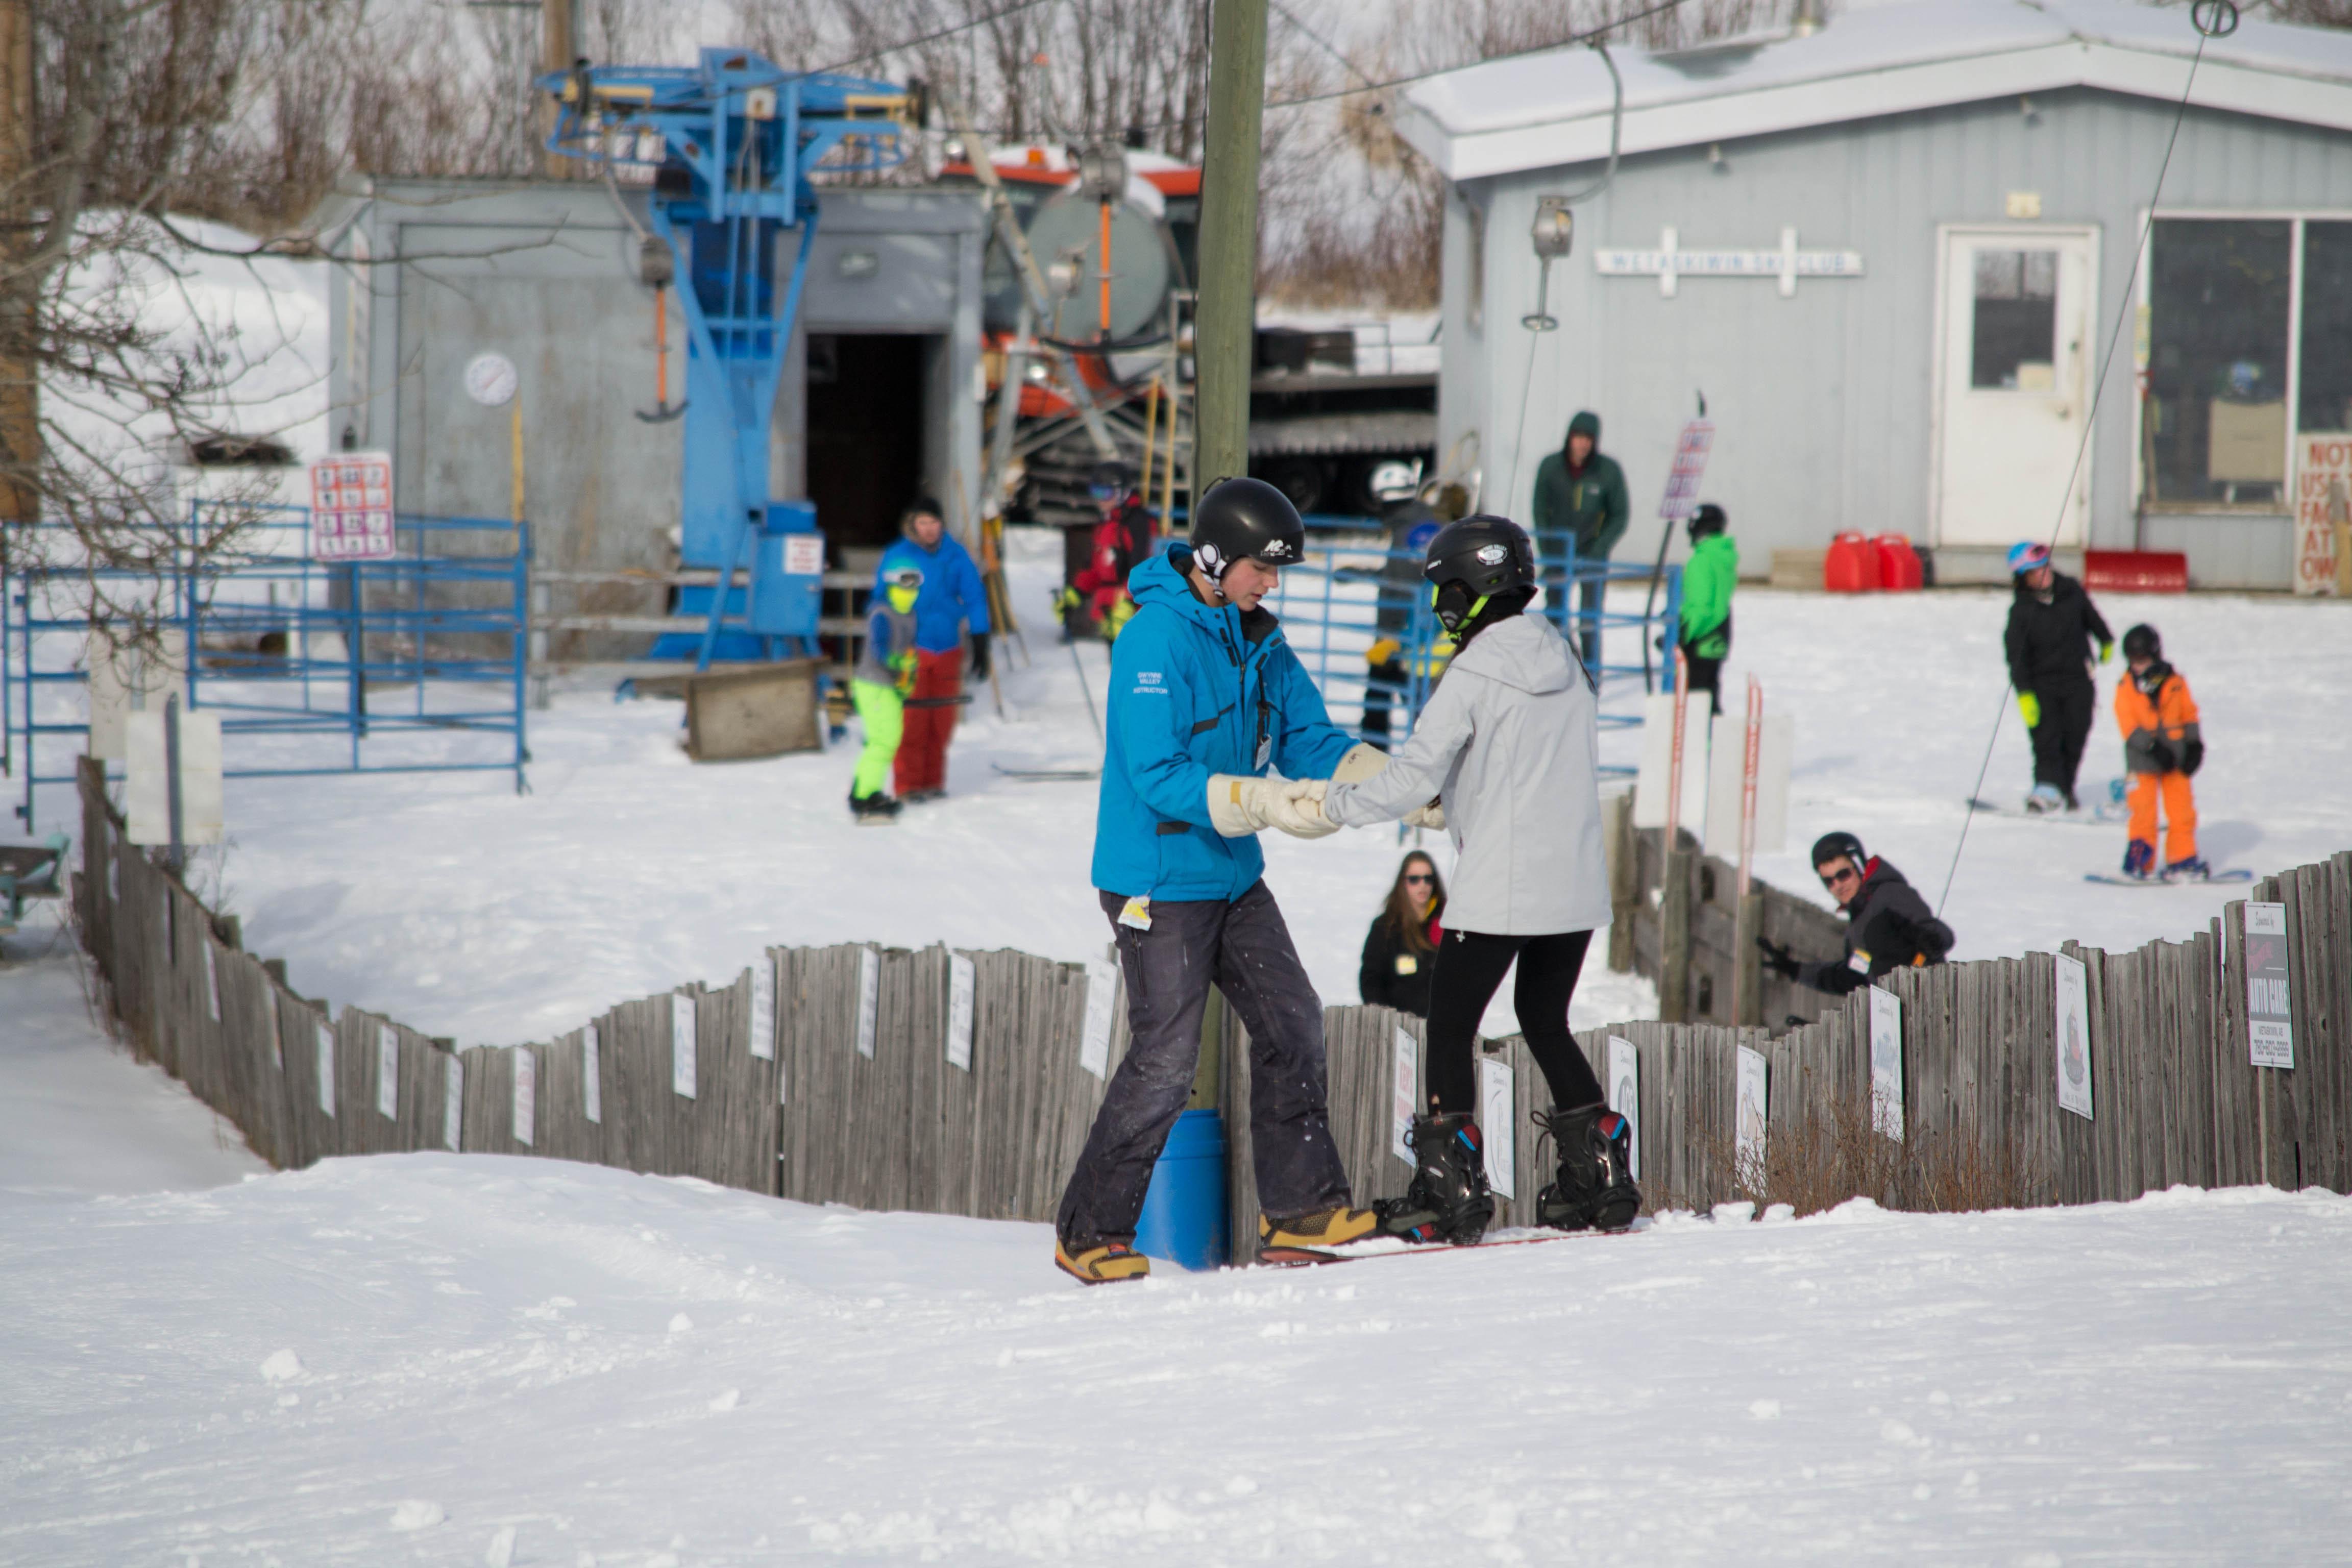 Friday Night Private Ski Lesson 7+yrs